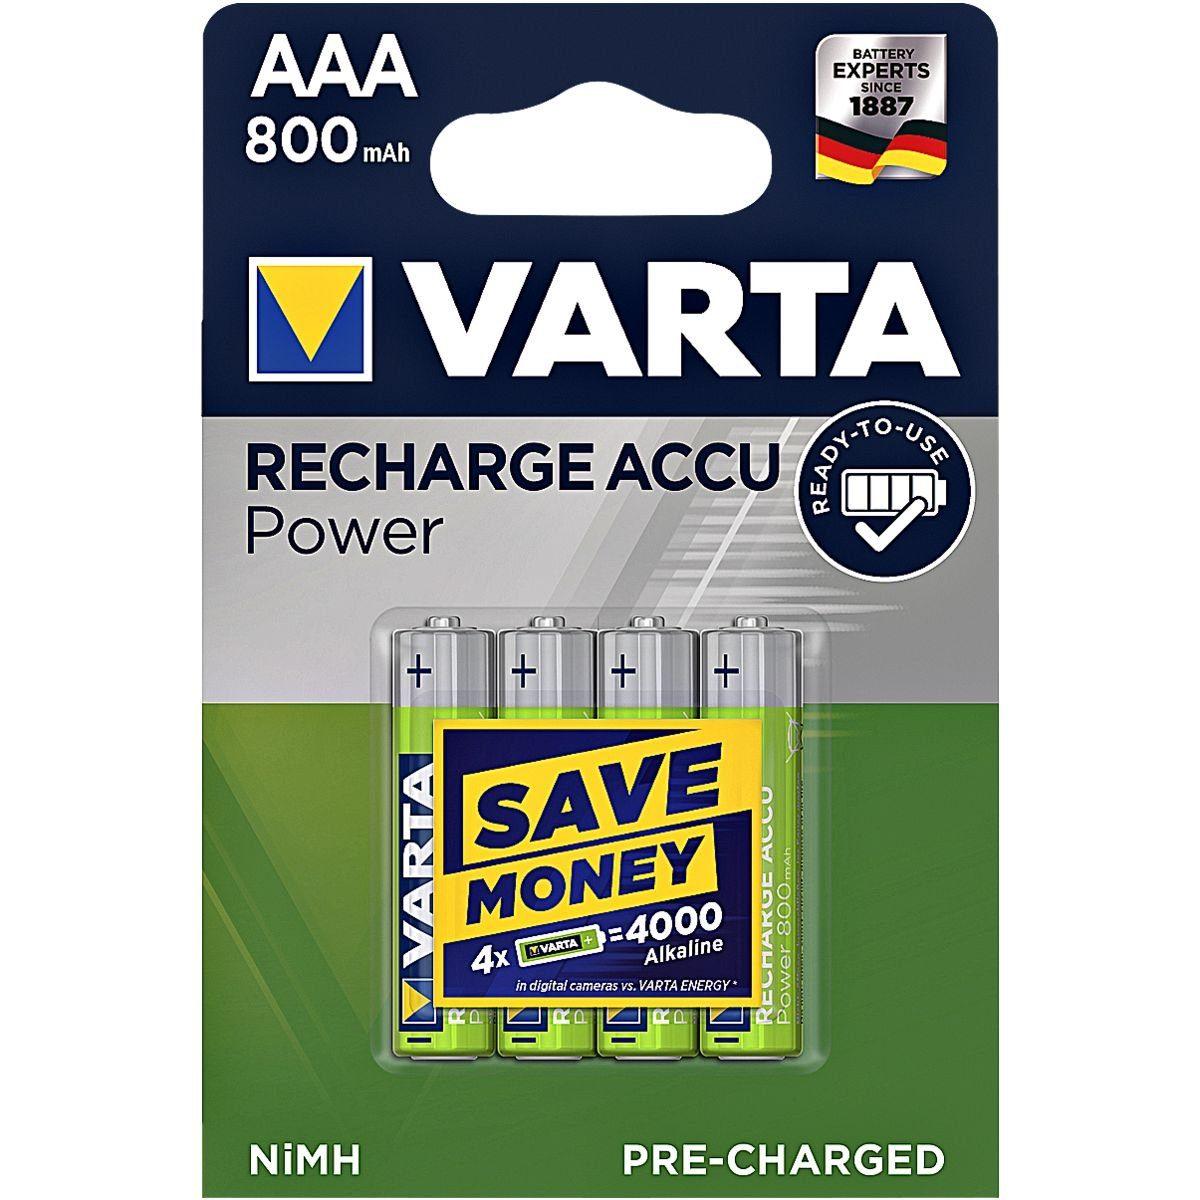 VARTA Akkus Micro / AAA / HR03 »RECHARGE ACCU Power«